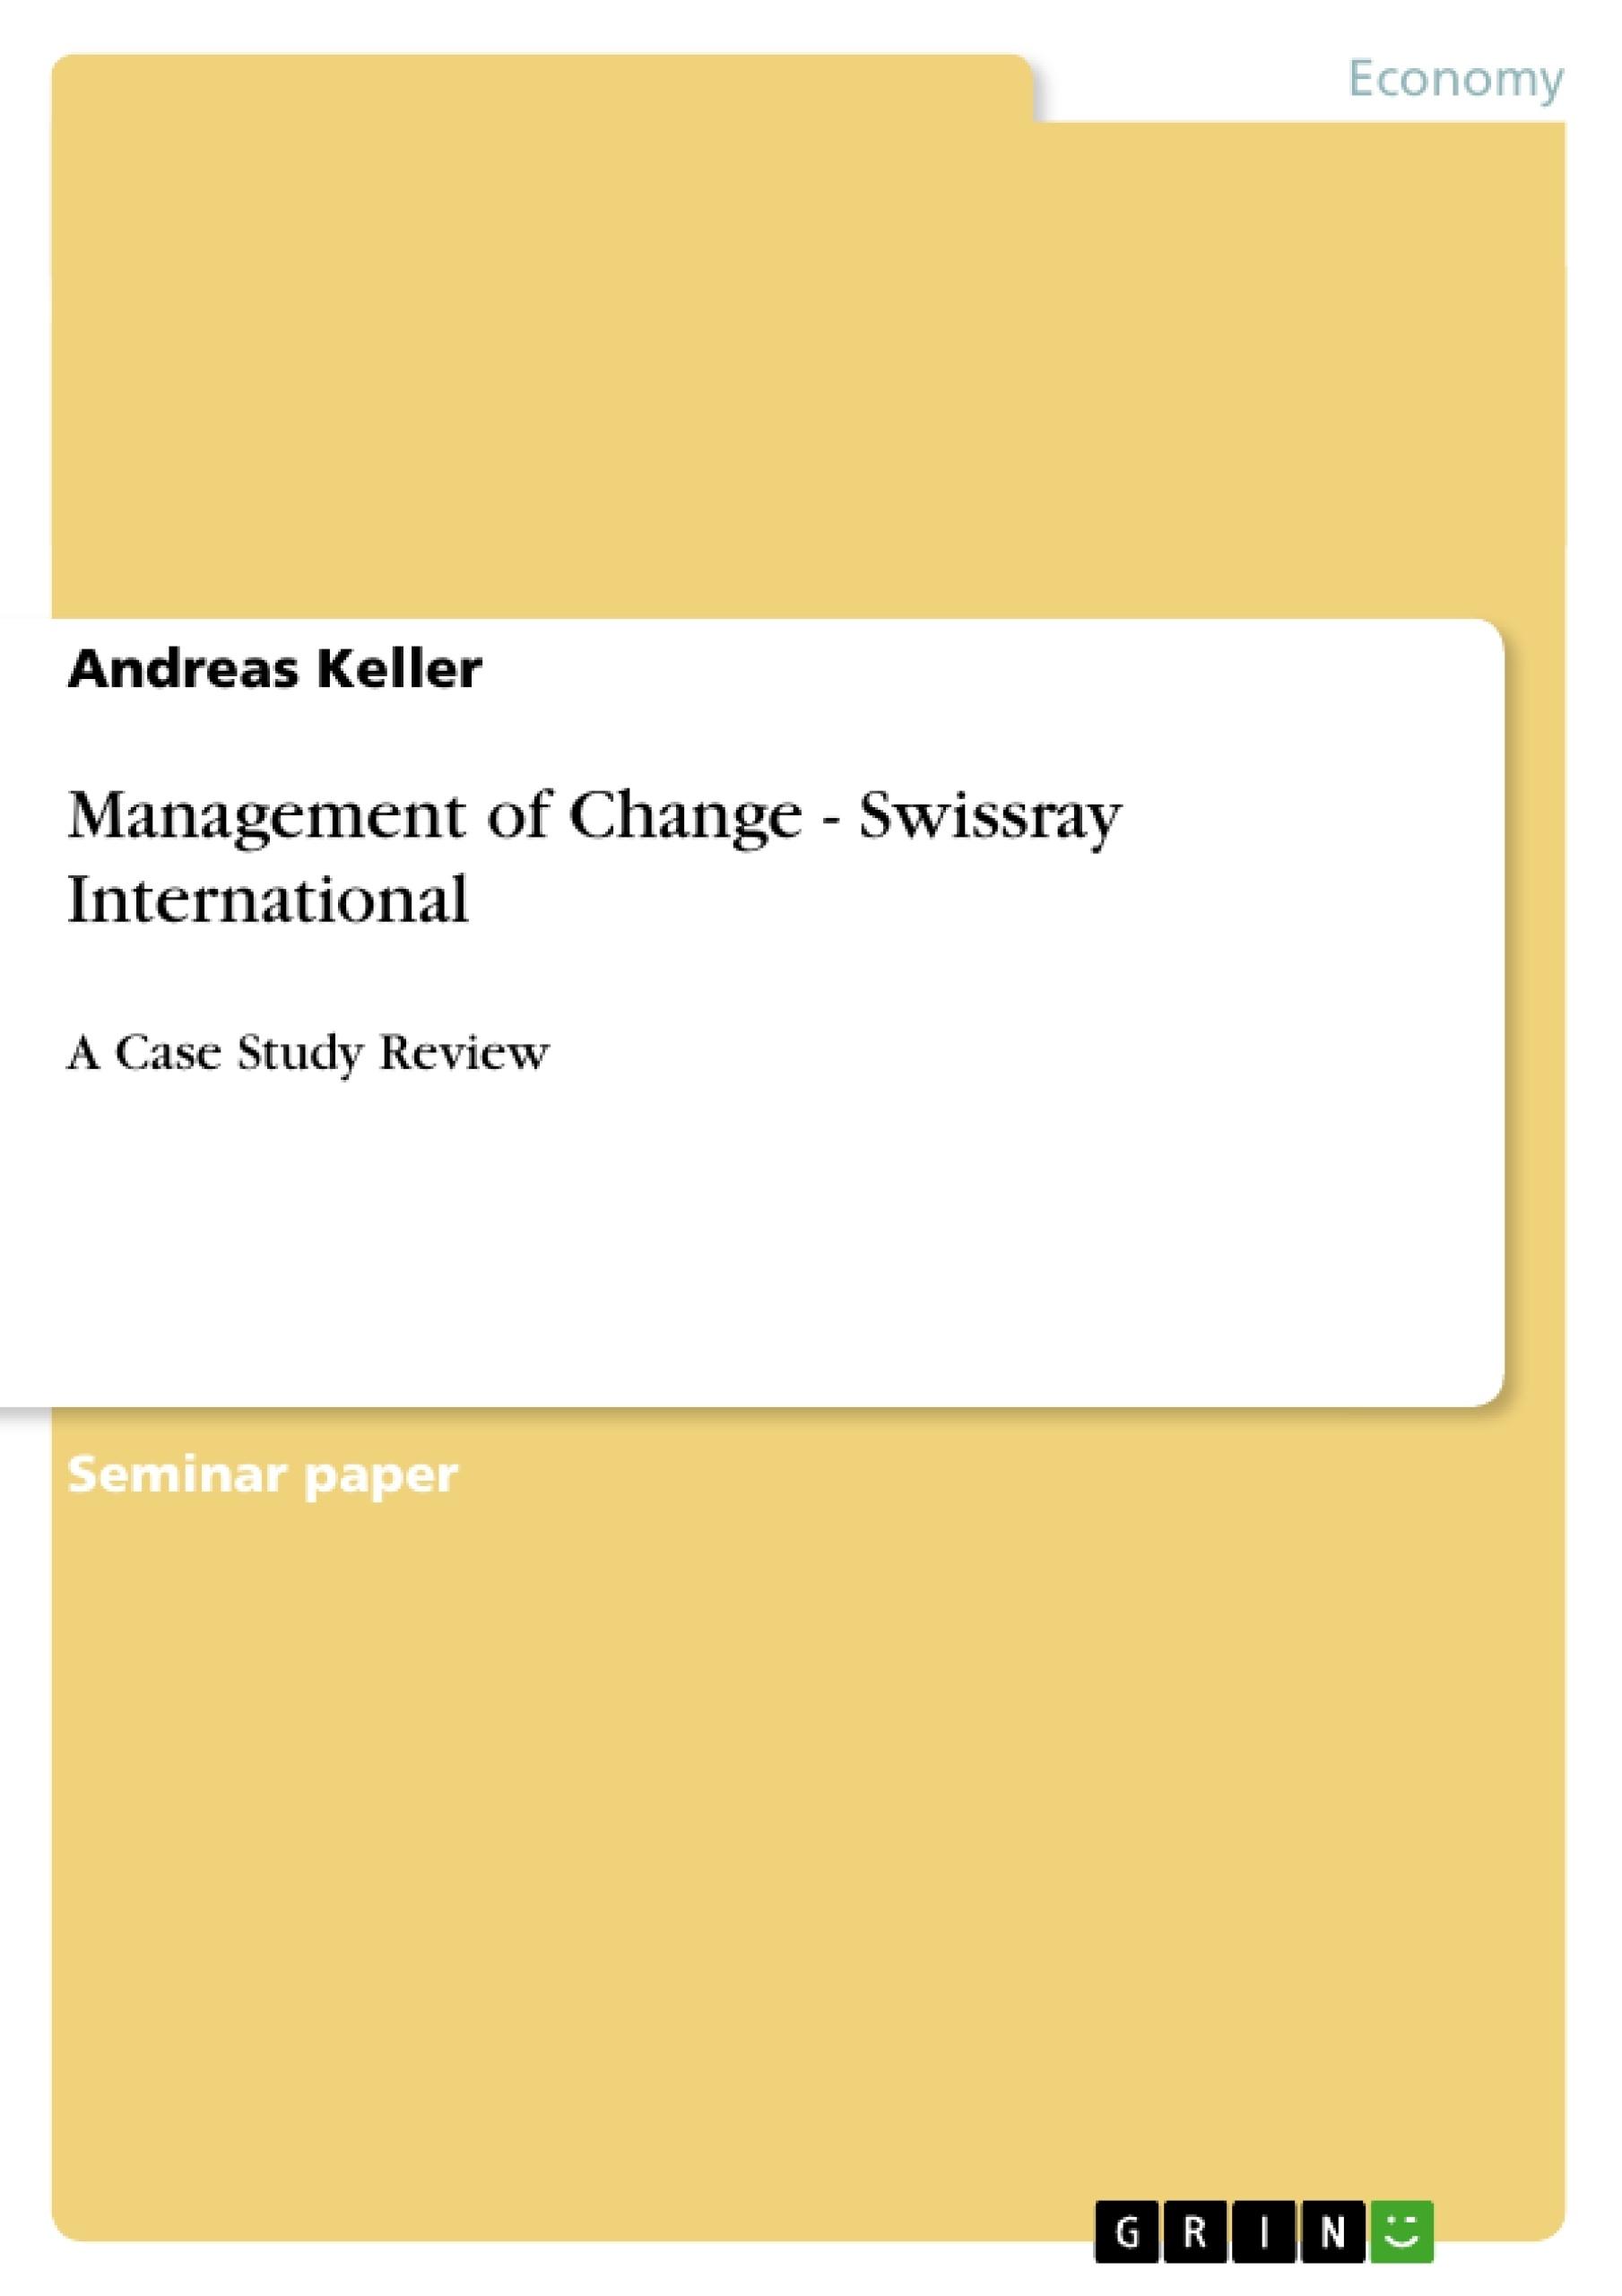 Title: Management of Change - Swissray International